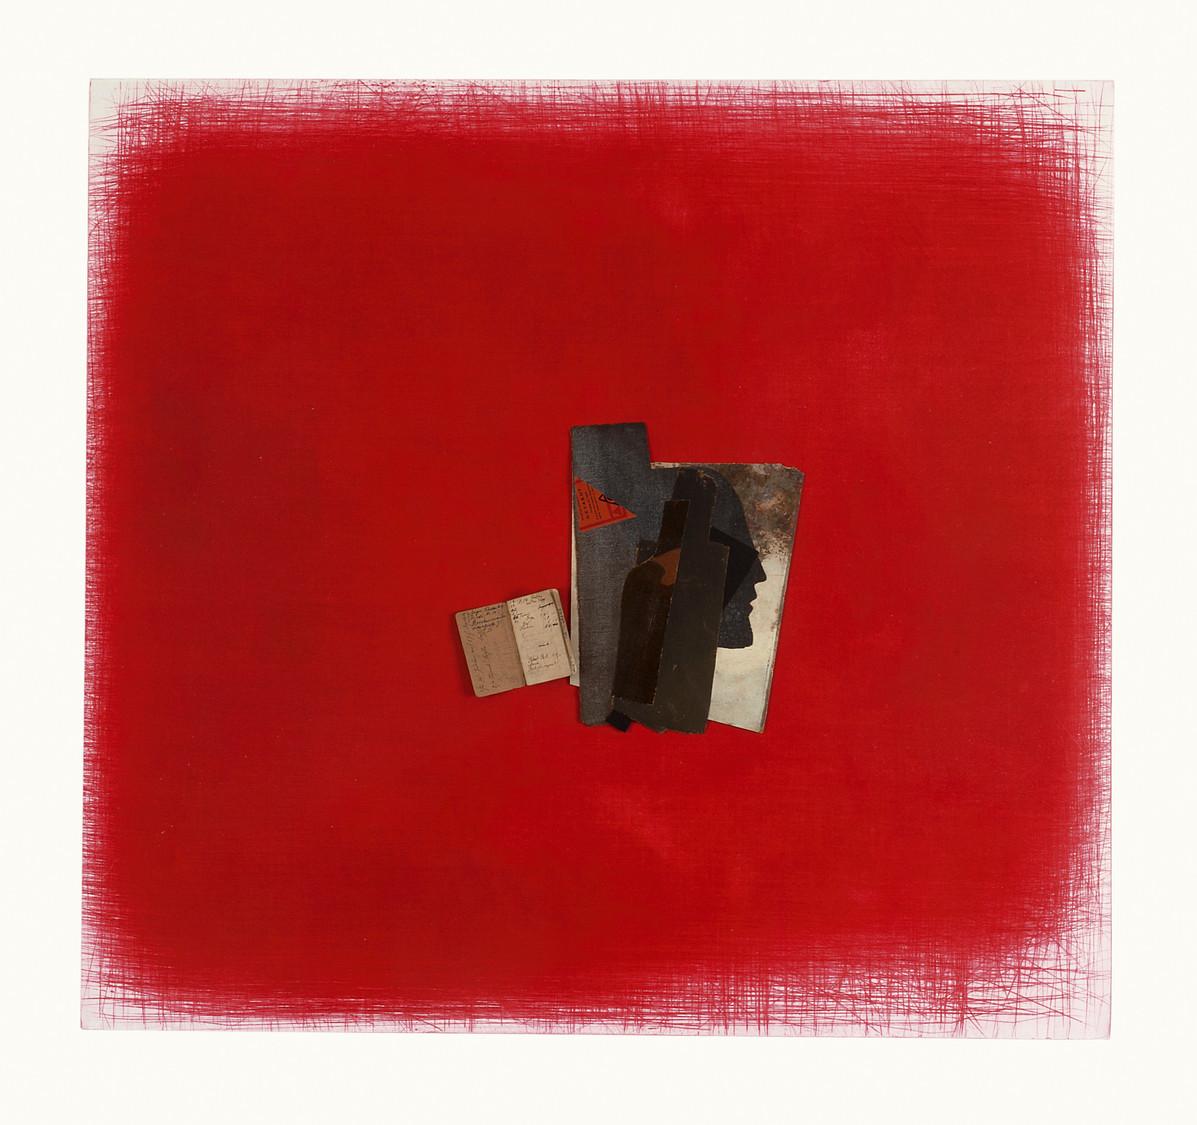 Untitled - 110 x 115 cm